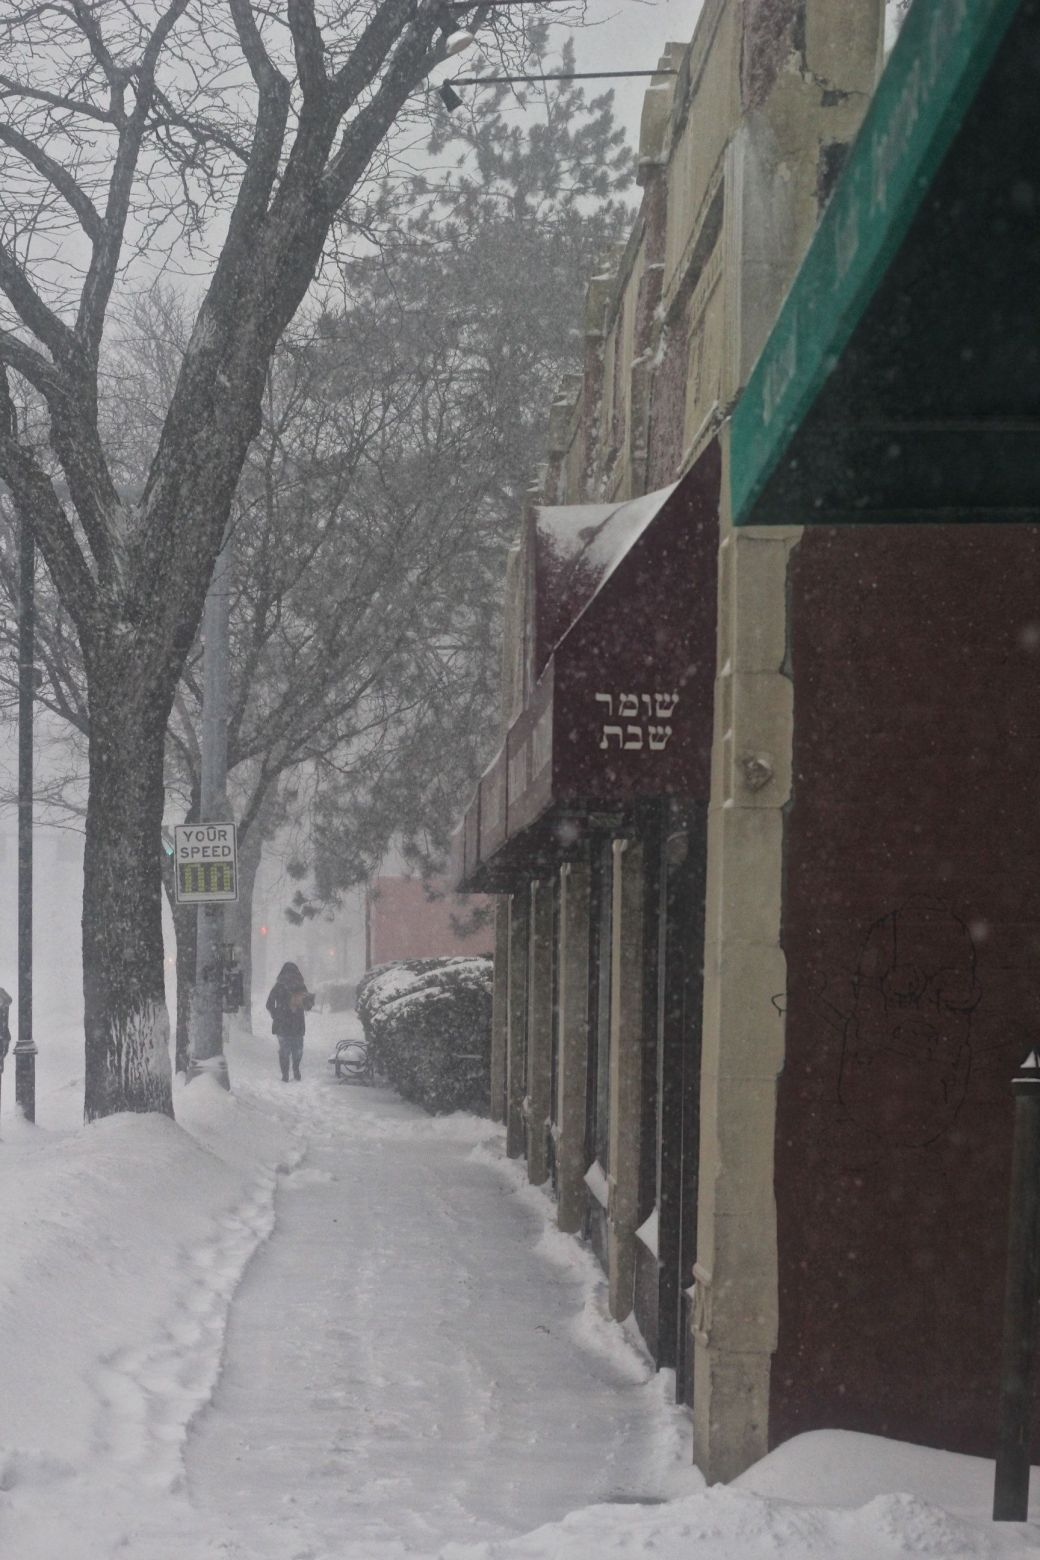 boston-snow-storm-february-9-2017-16